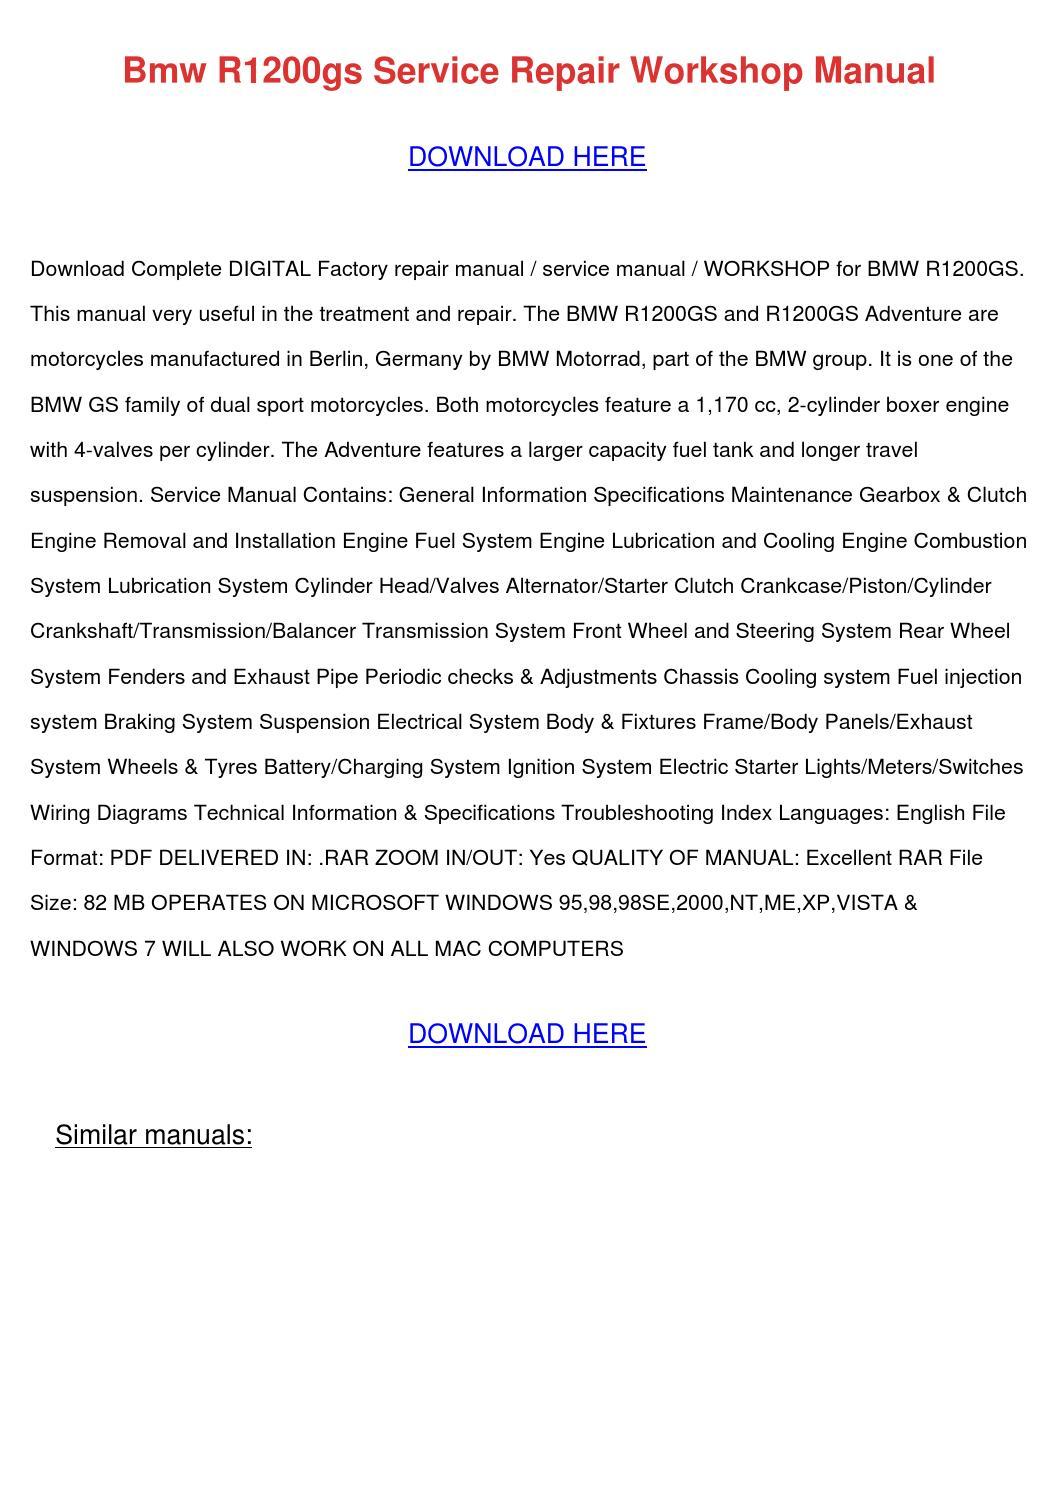 Bmw R1200gs Service Repair Workshop Manual by .